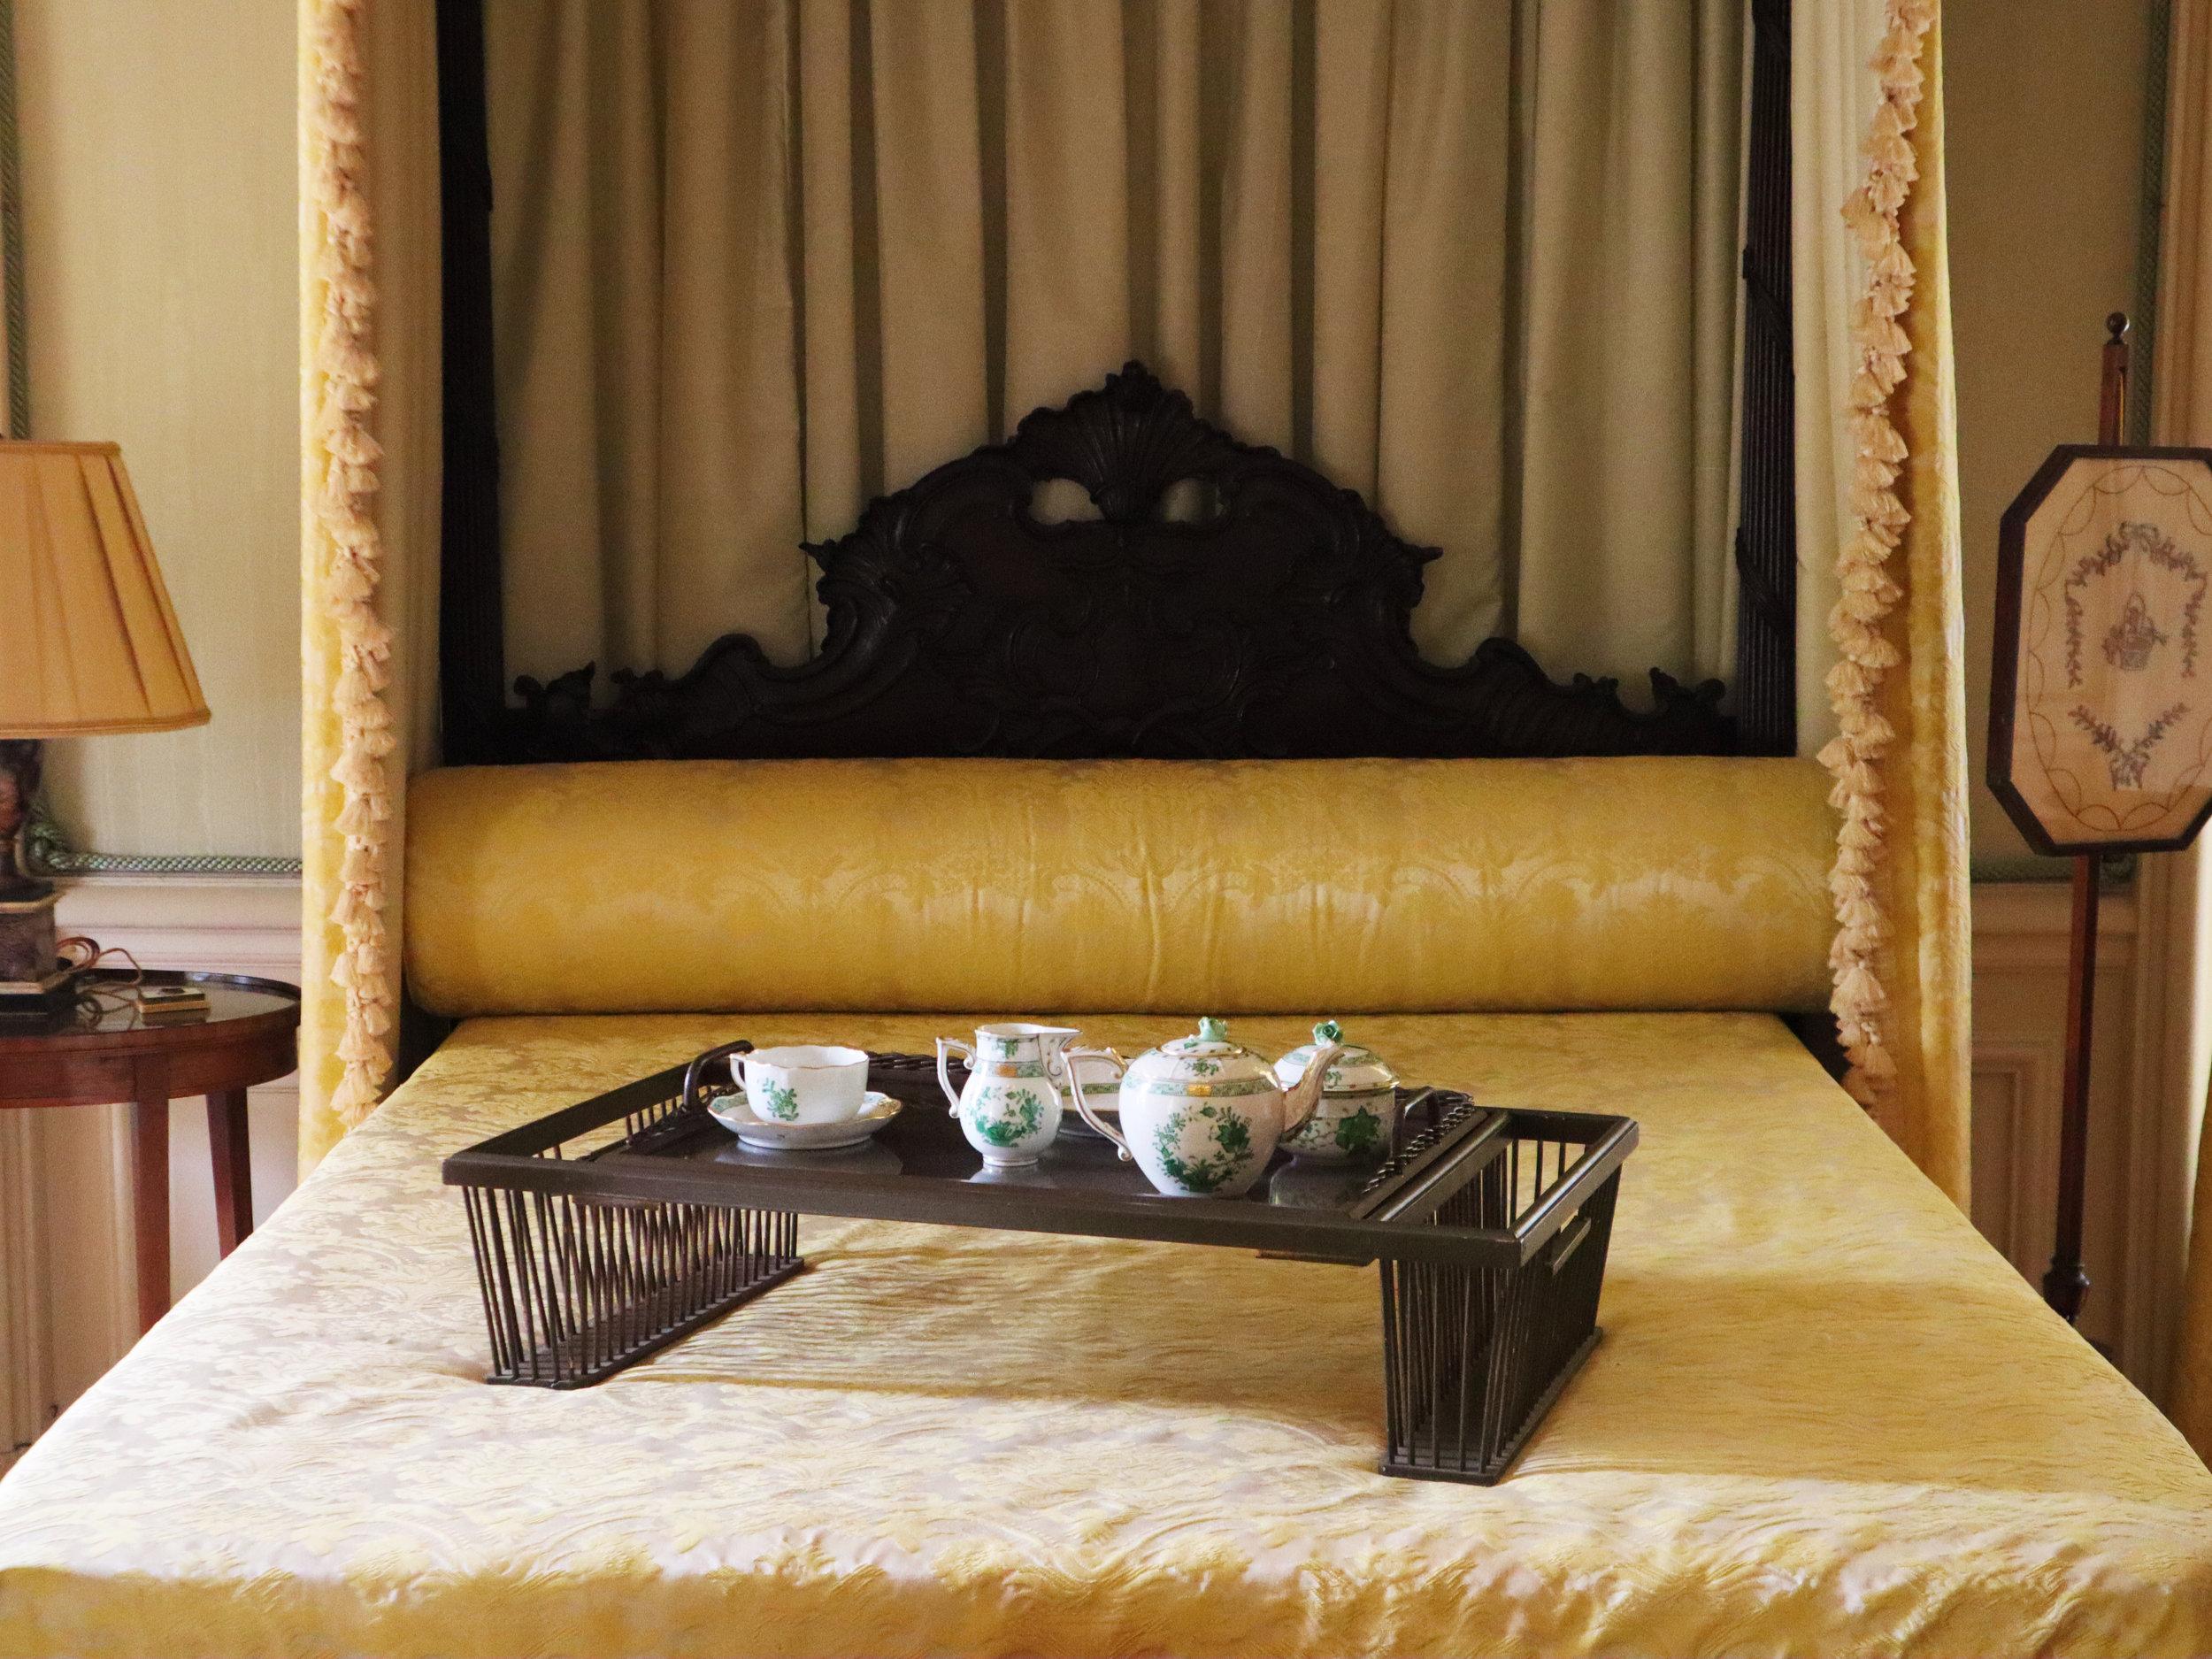 The Elms внутри особняка спальня кровать.jpg